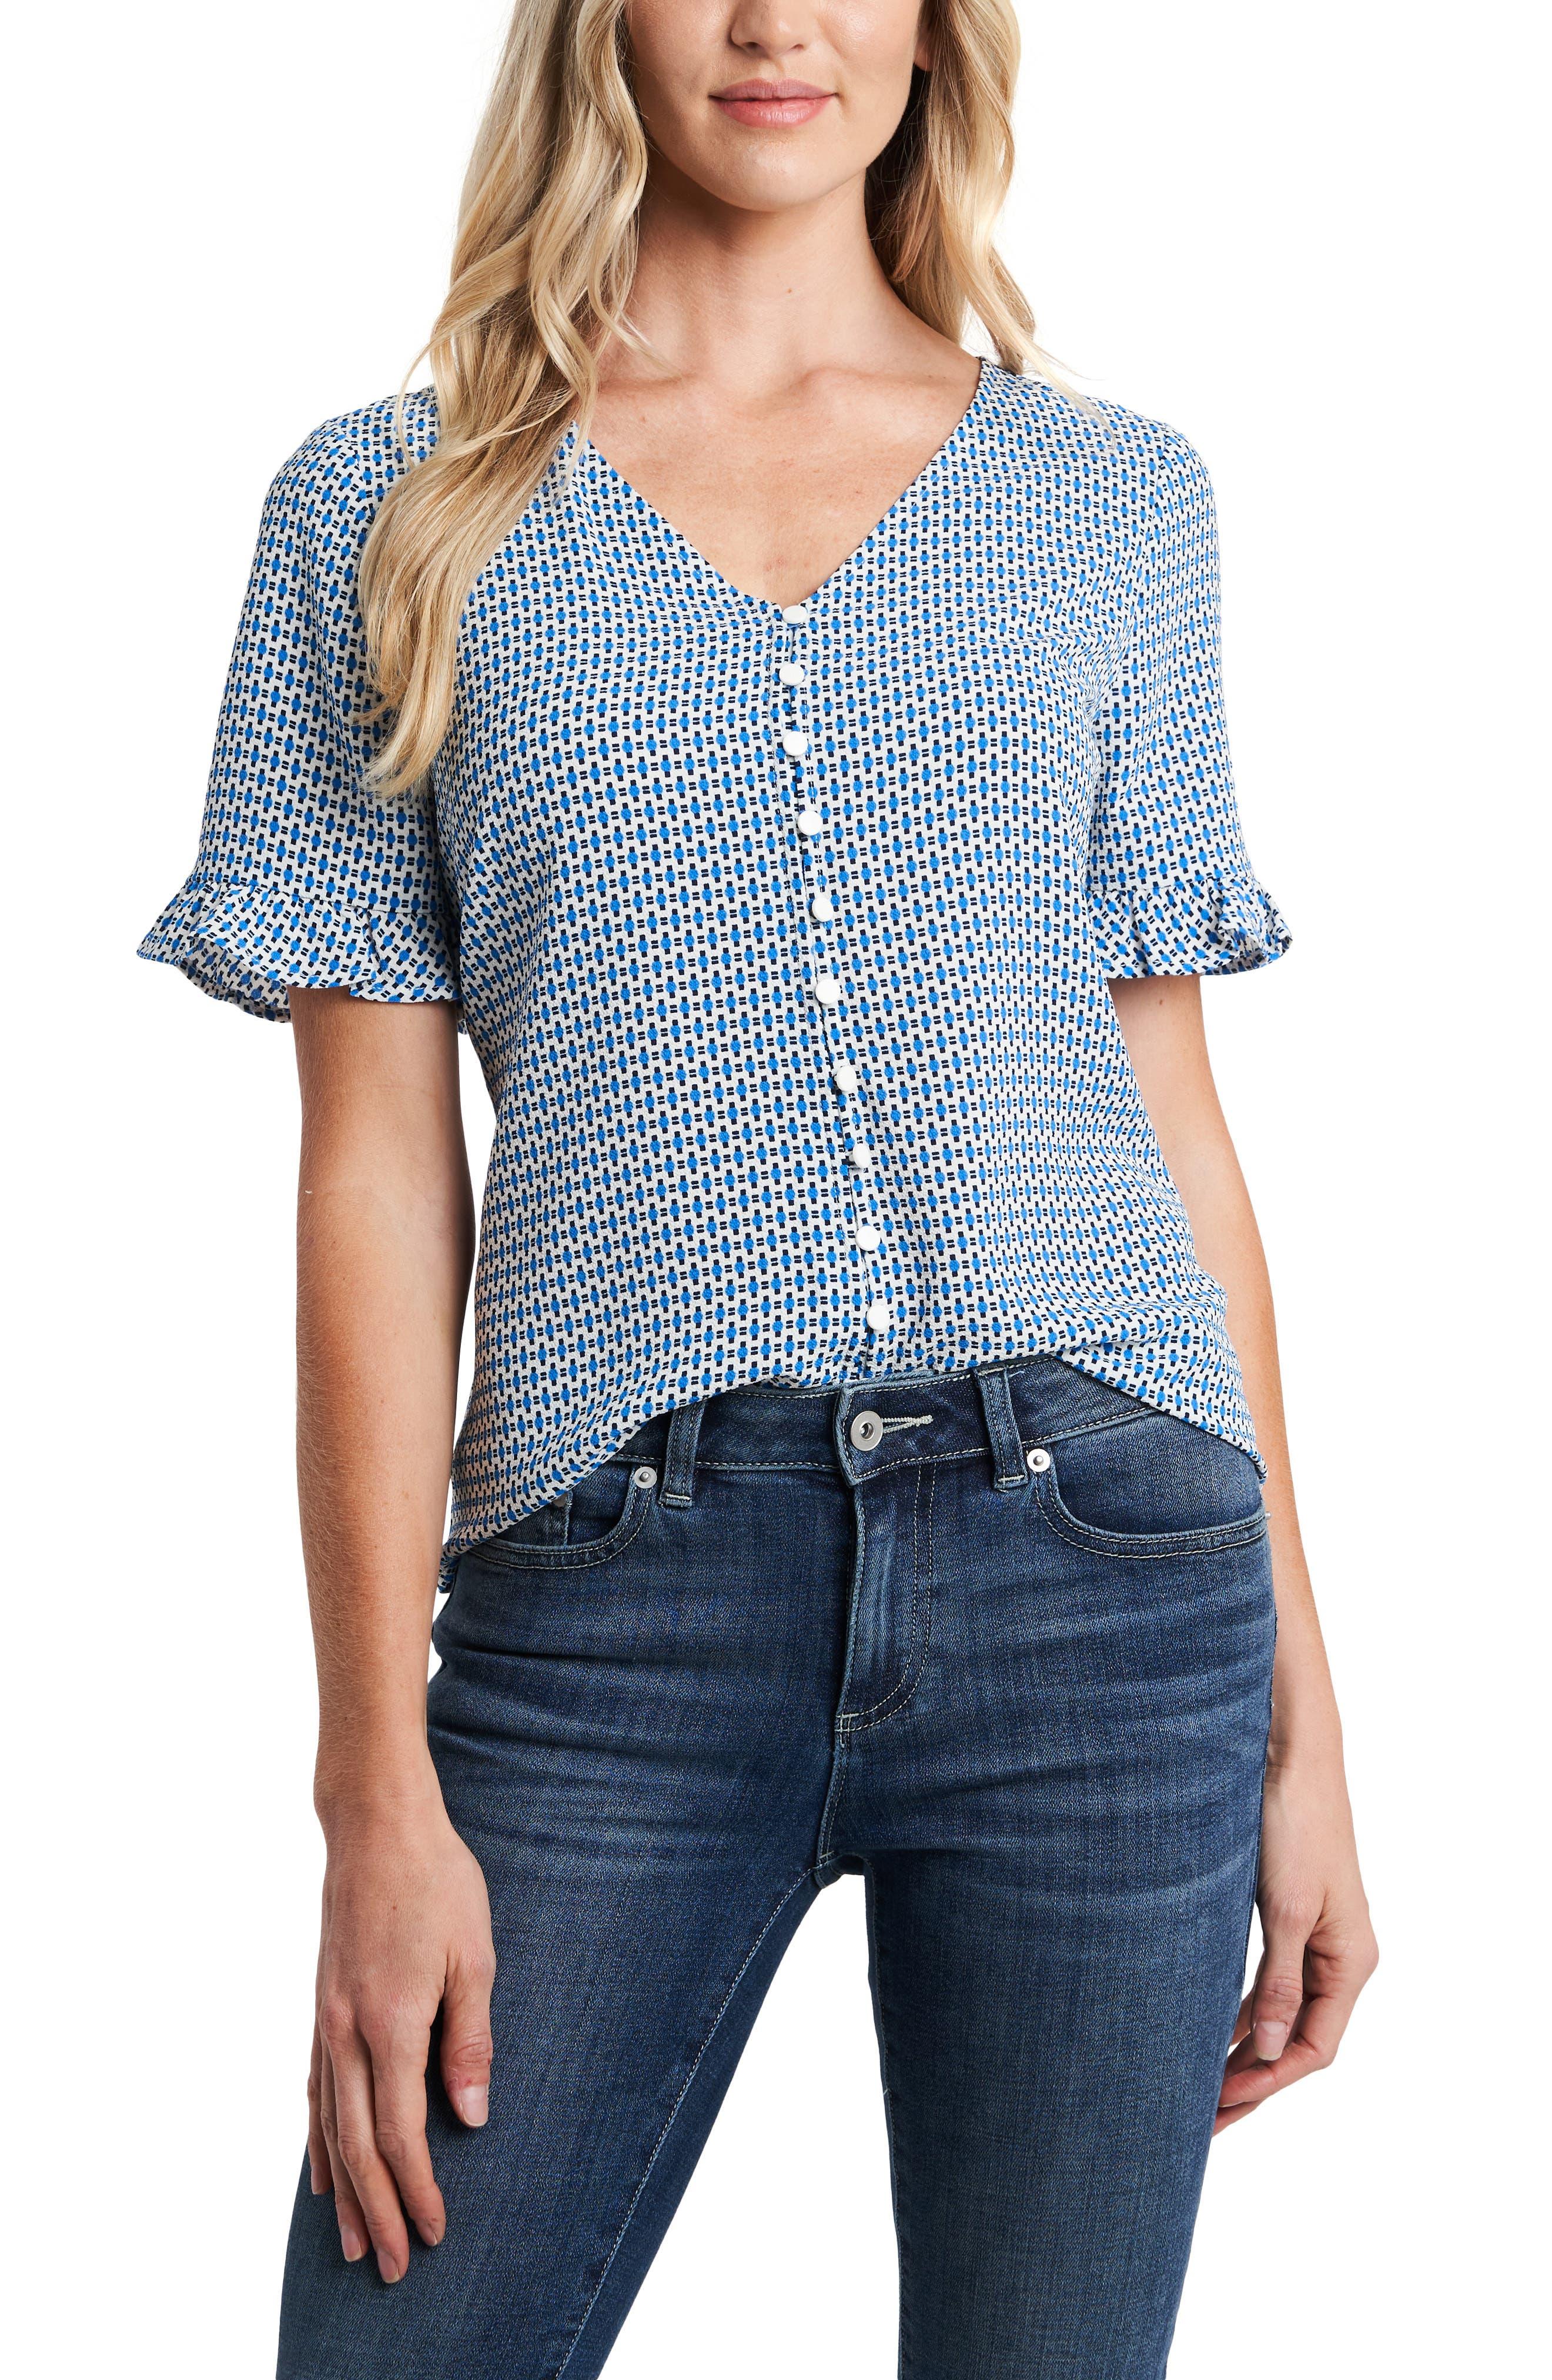 CeCe Women's Cece Garden Geo Print Ruffle Sleeve Top, Size X-Large - Blue